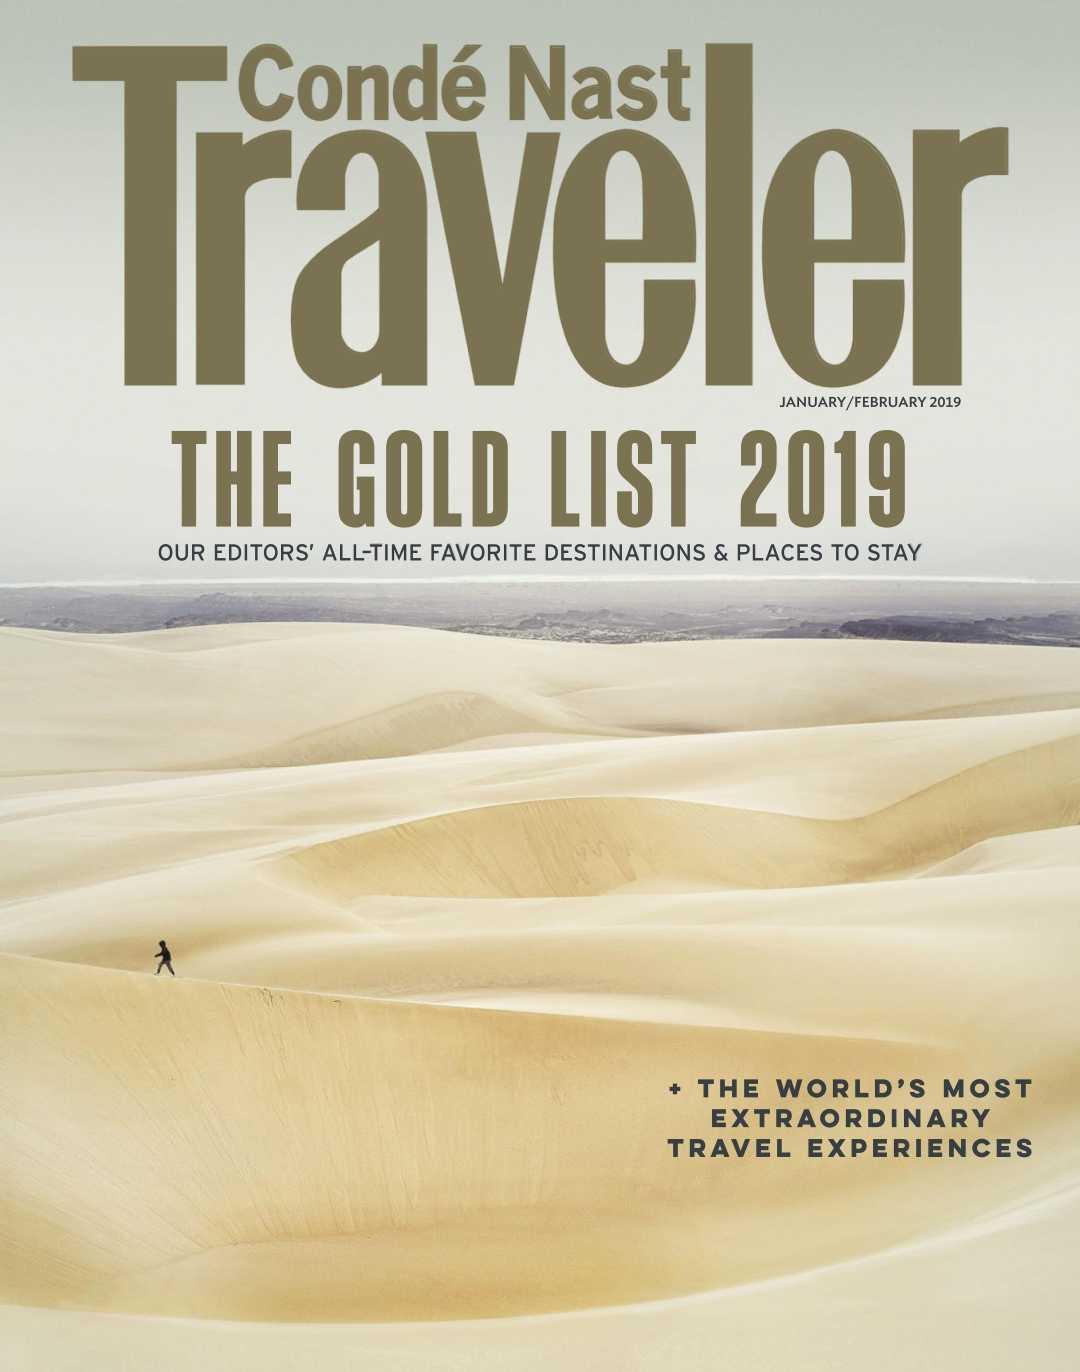 conde-nast-traveler-cover-jan2019